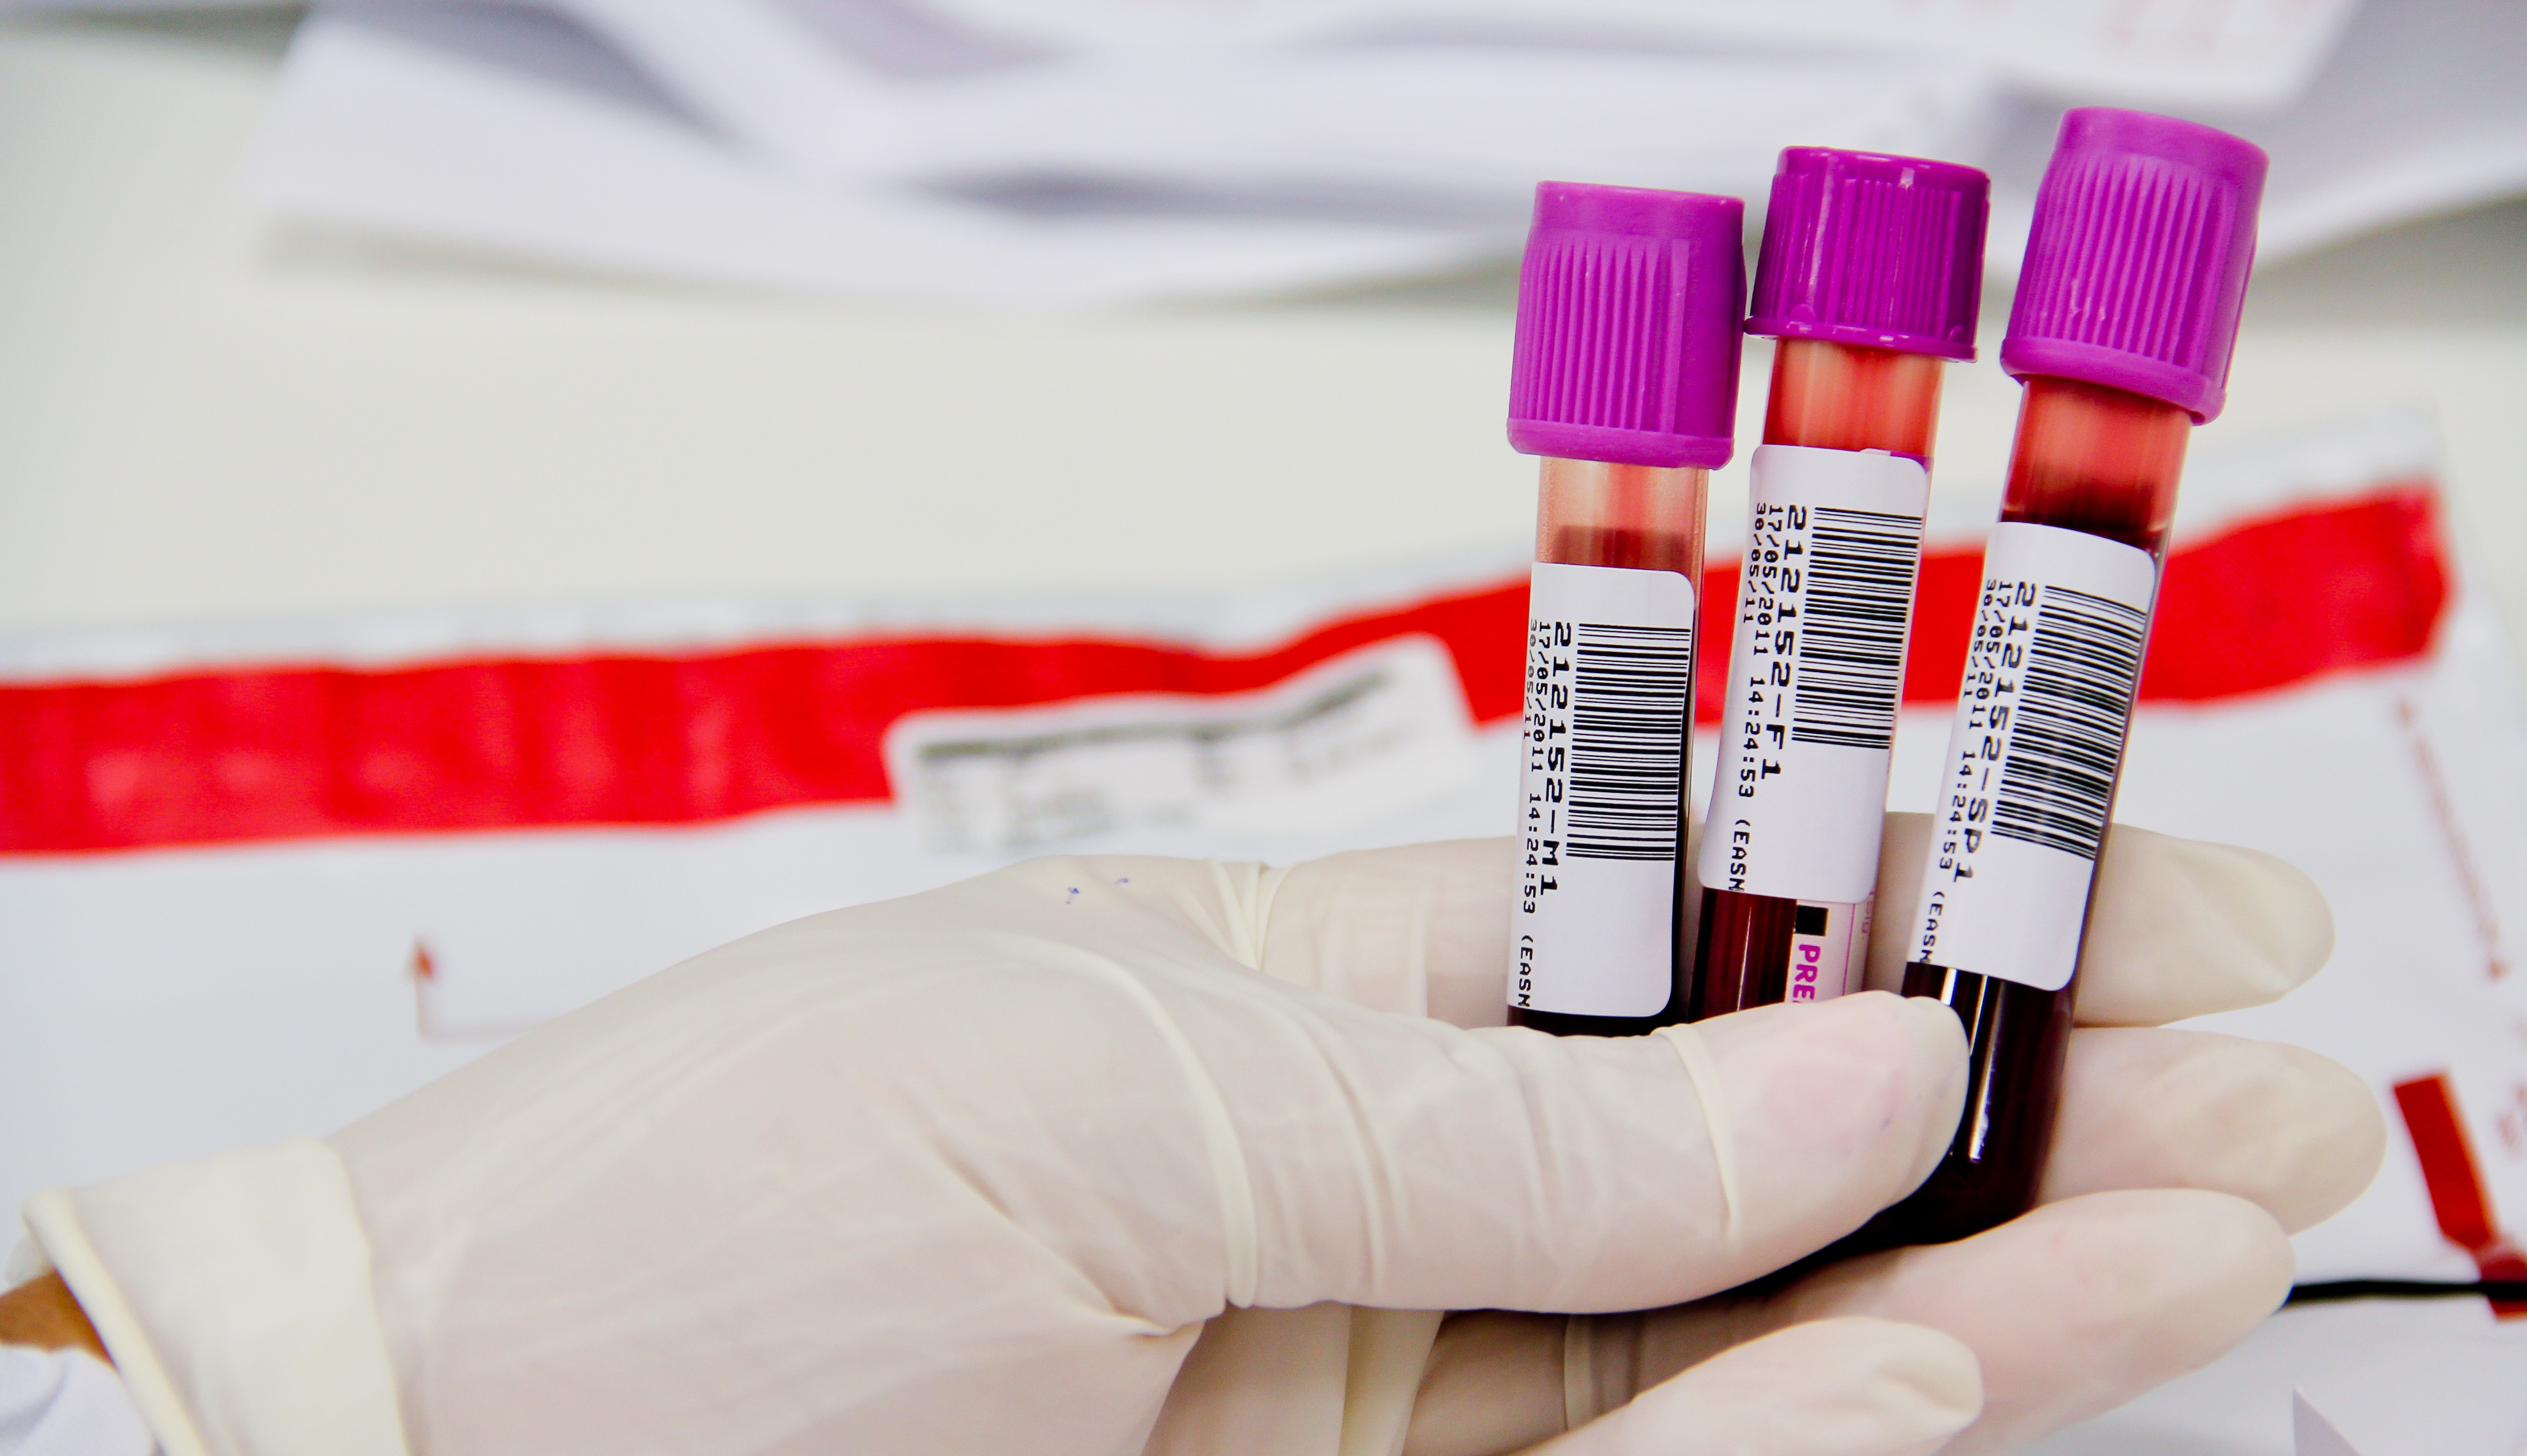 Tipo de exames de sangue